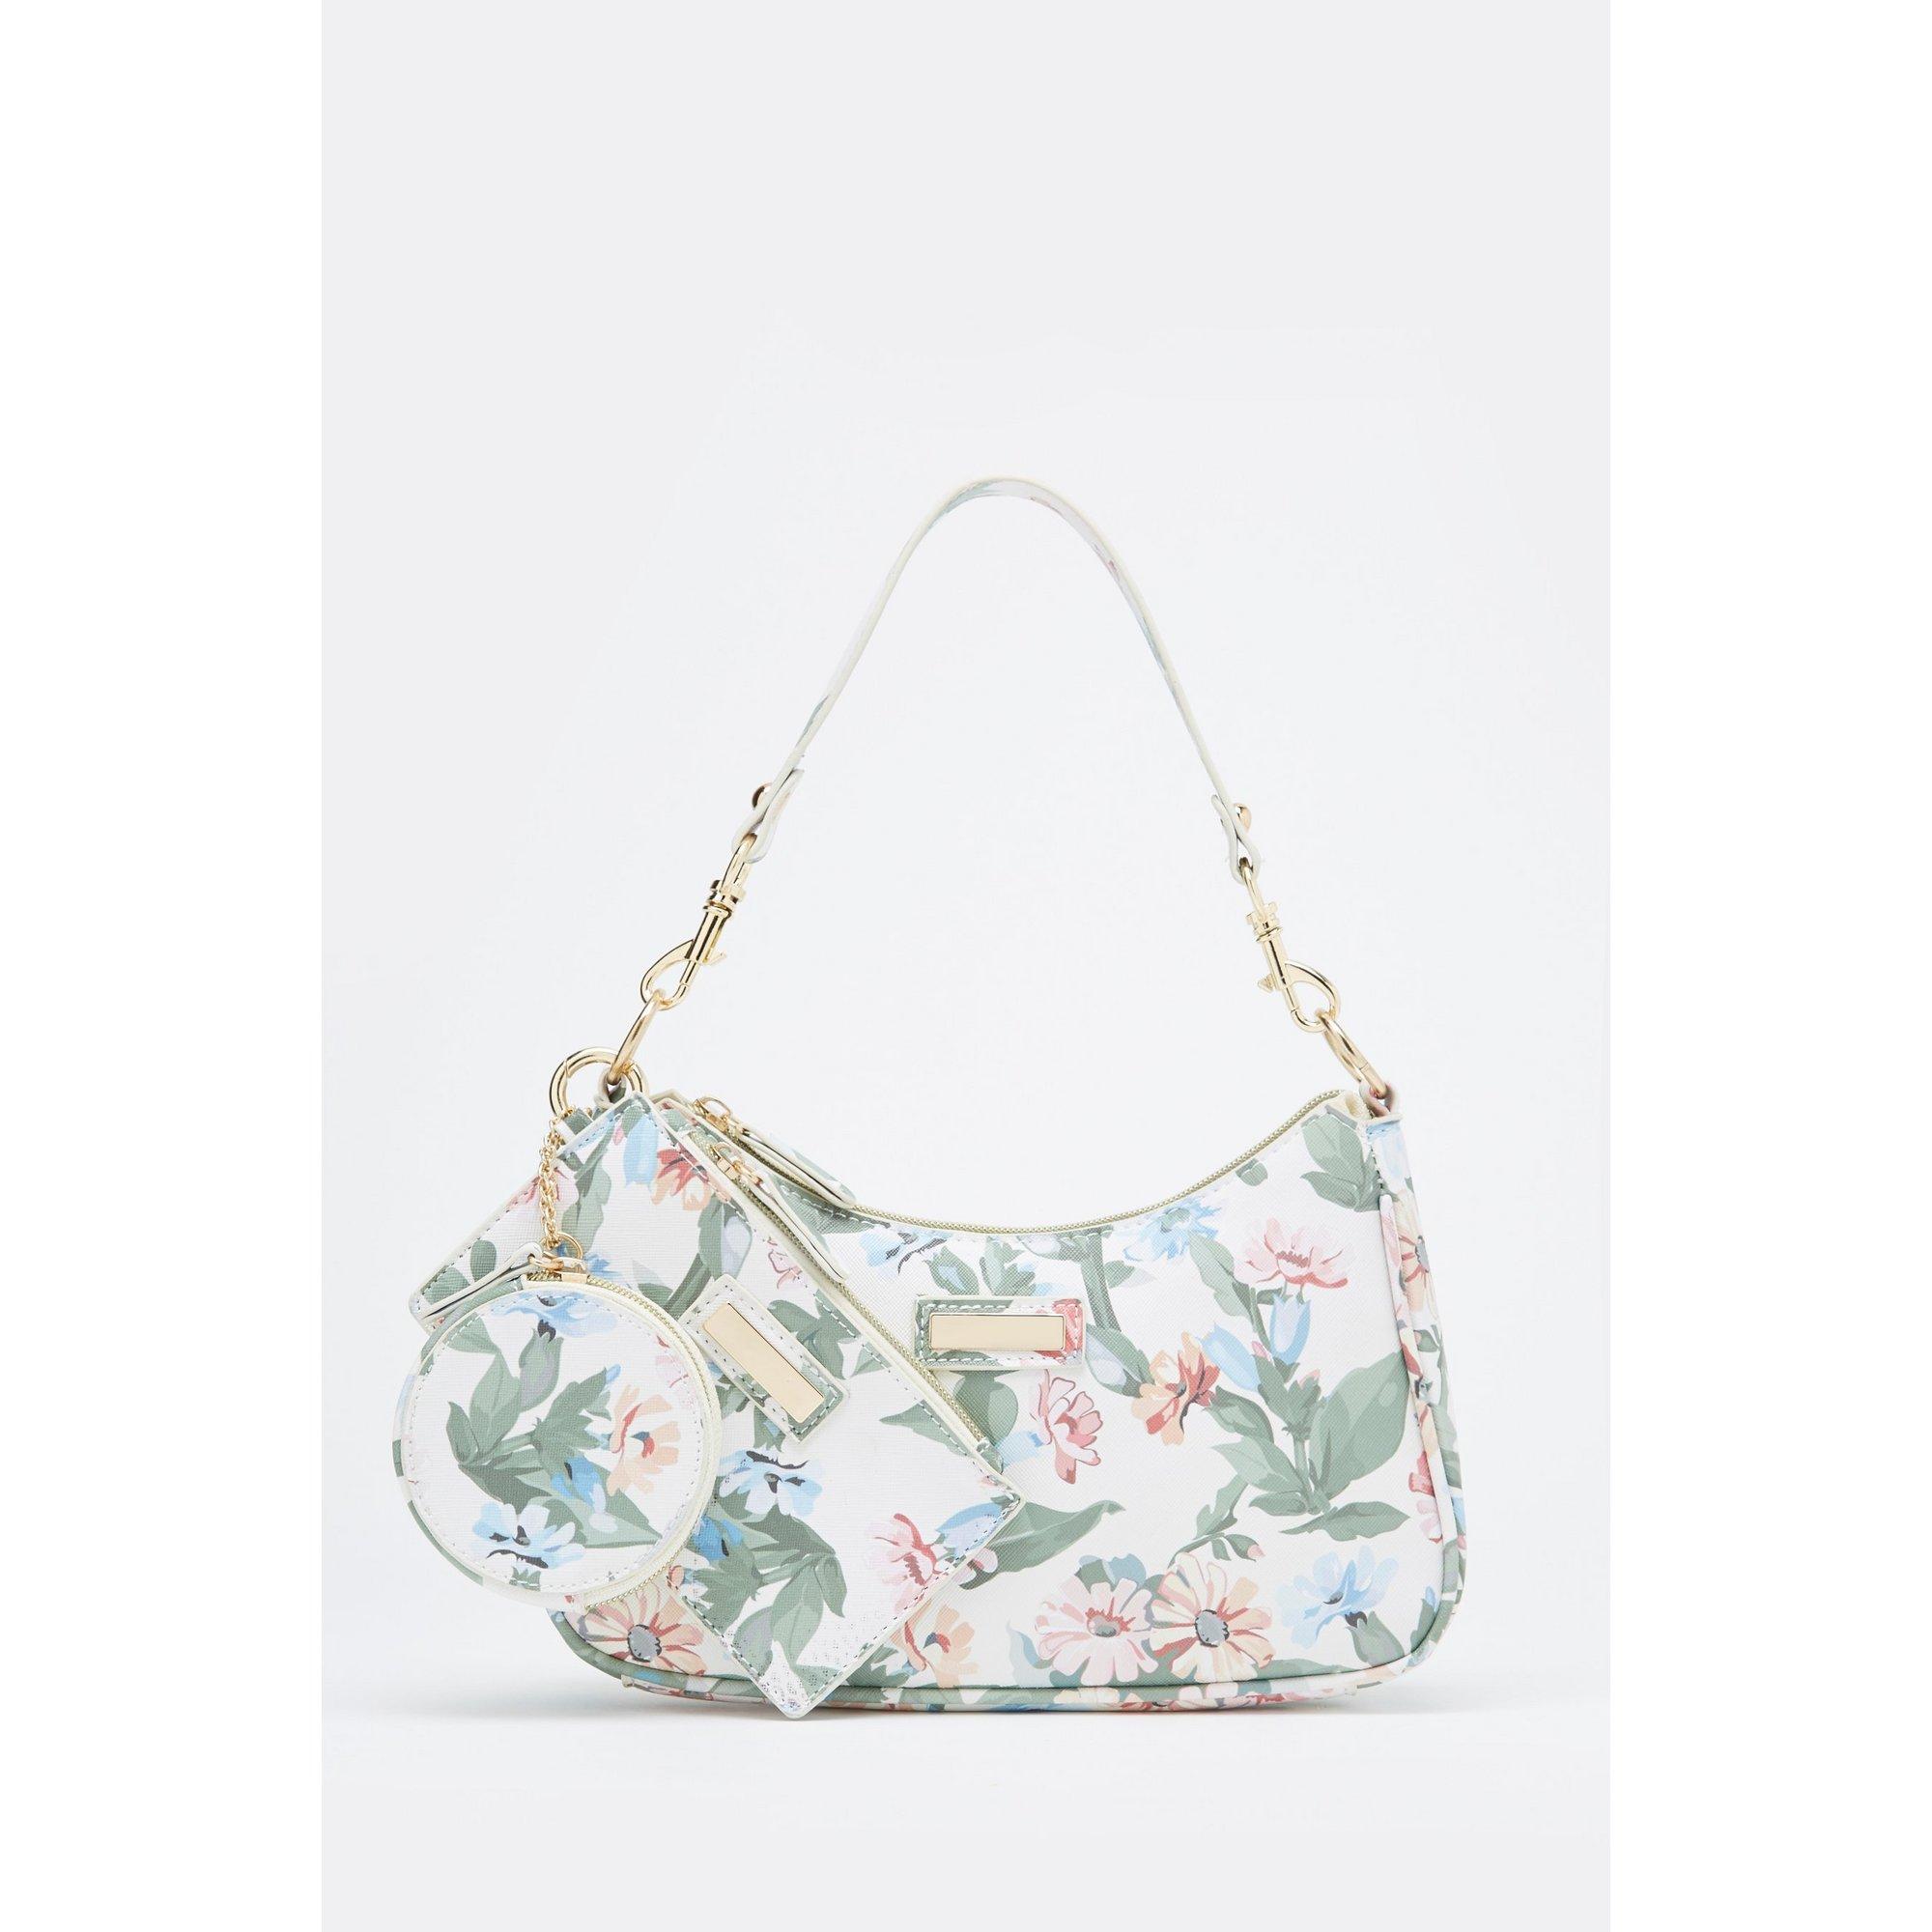 Image of 3-Piece Cream Floral Shoulder Bag&#44 Large Purse and Coin Purse Set